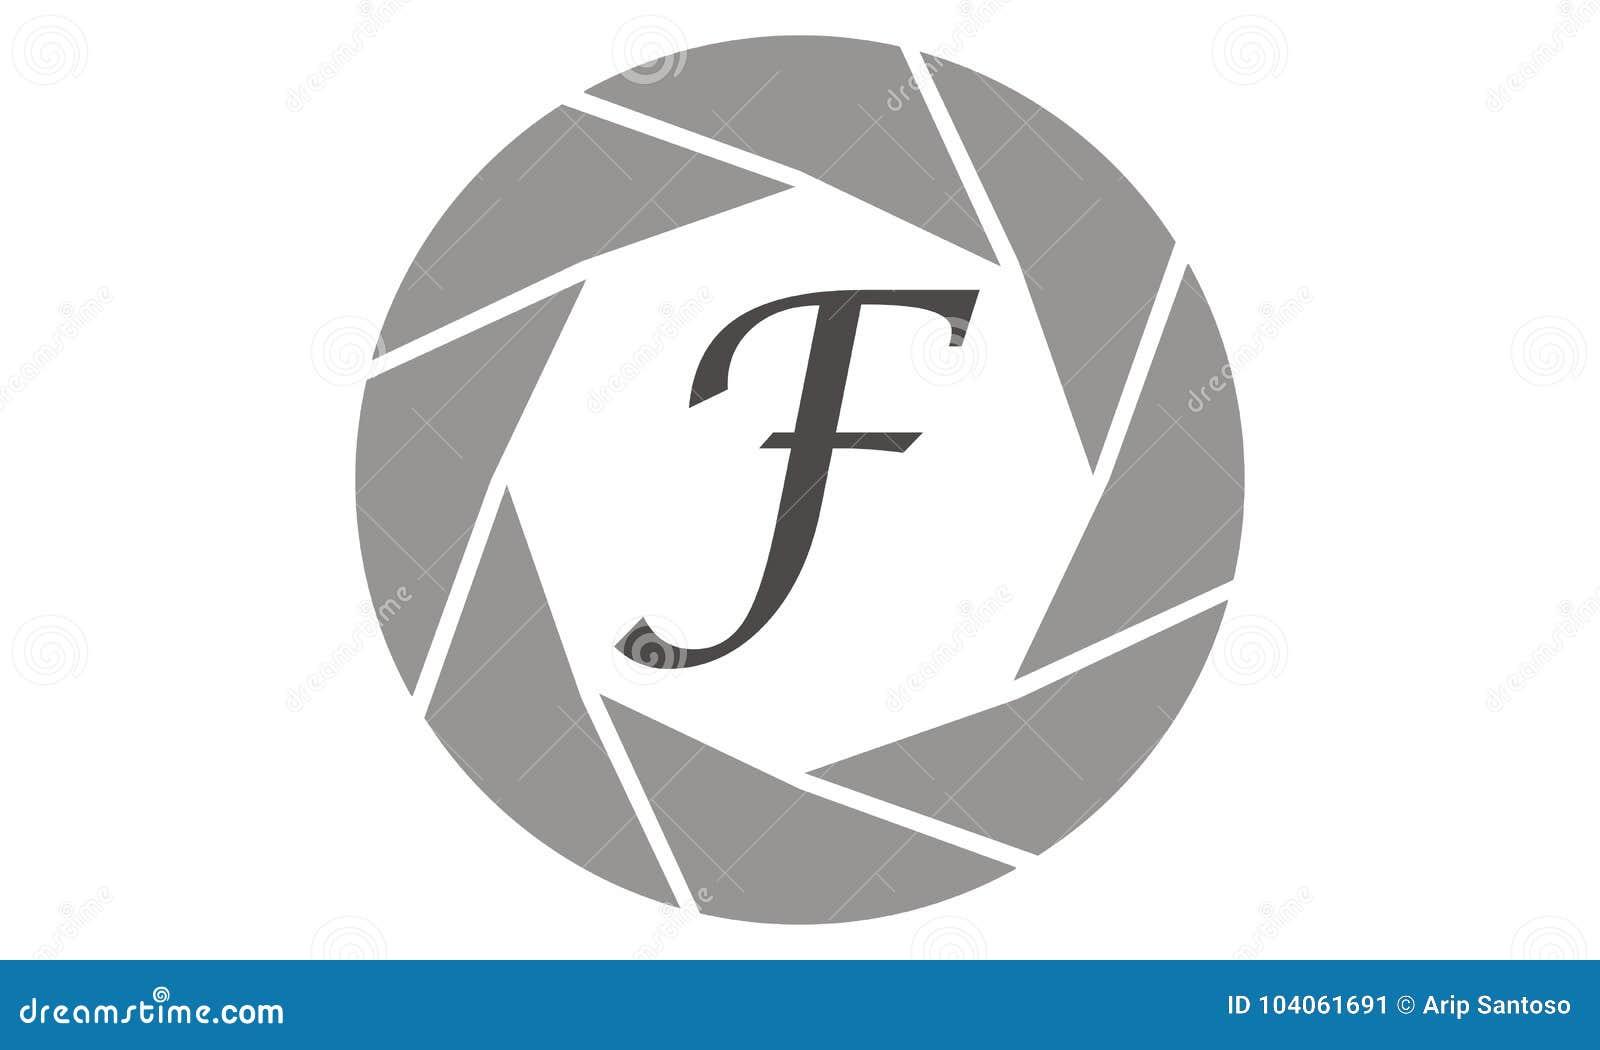 af869c44c1 Photography Service Letter F Stock Vector - Illustration of device ...